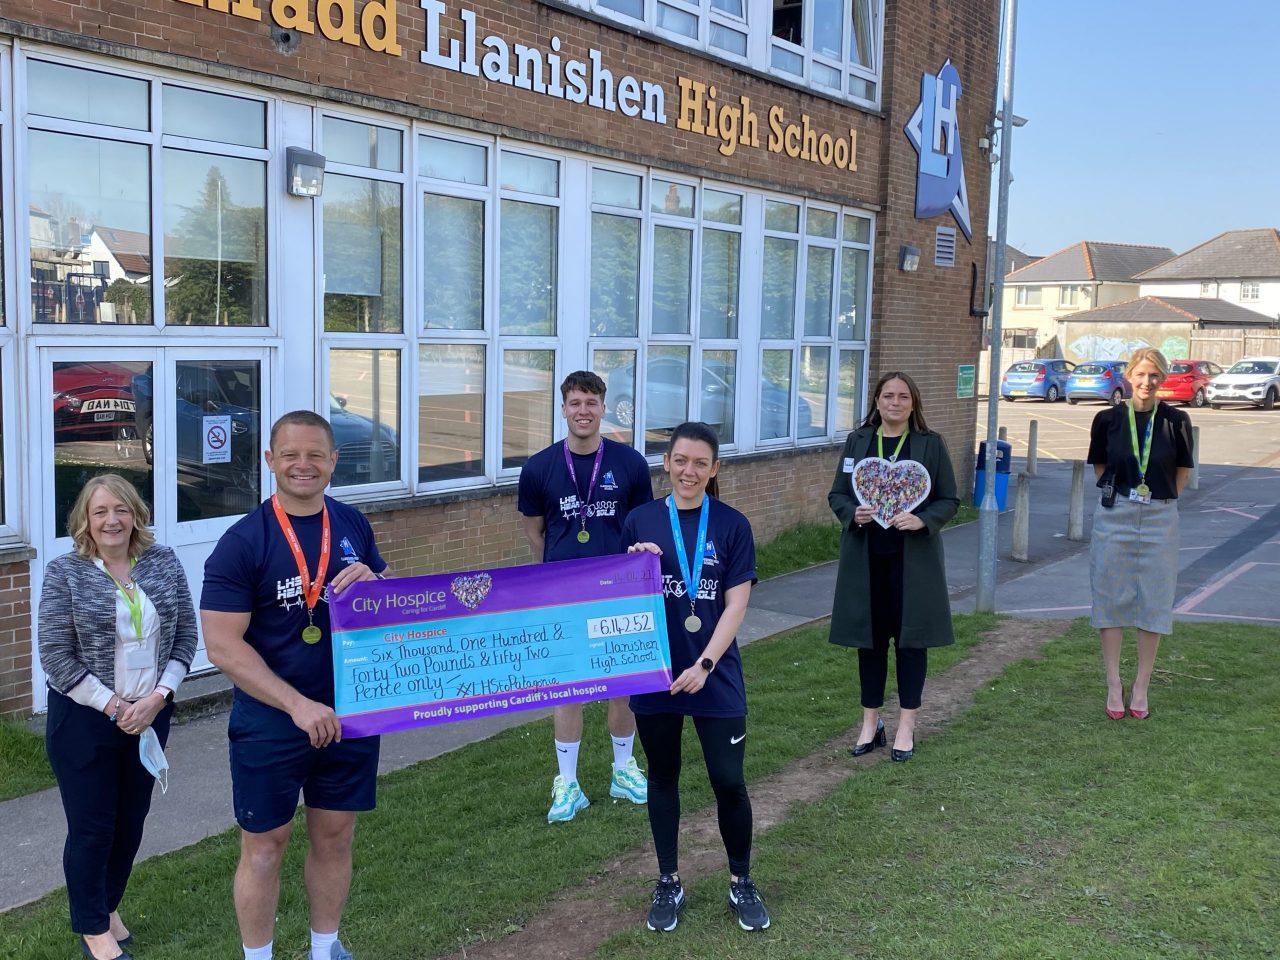 Llanishen High School raise over £6000 for City Hospice